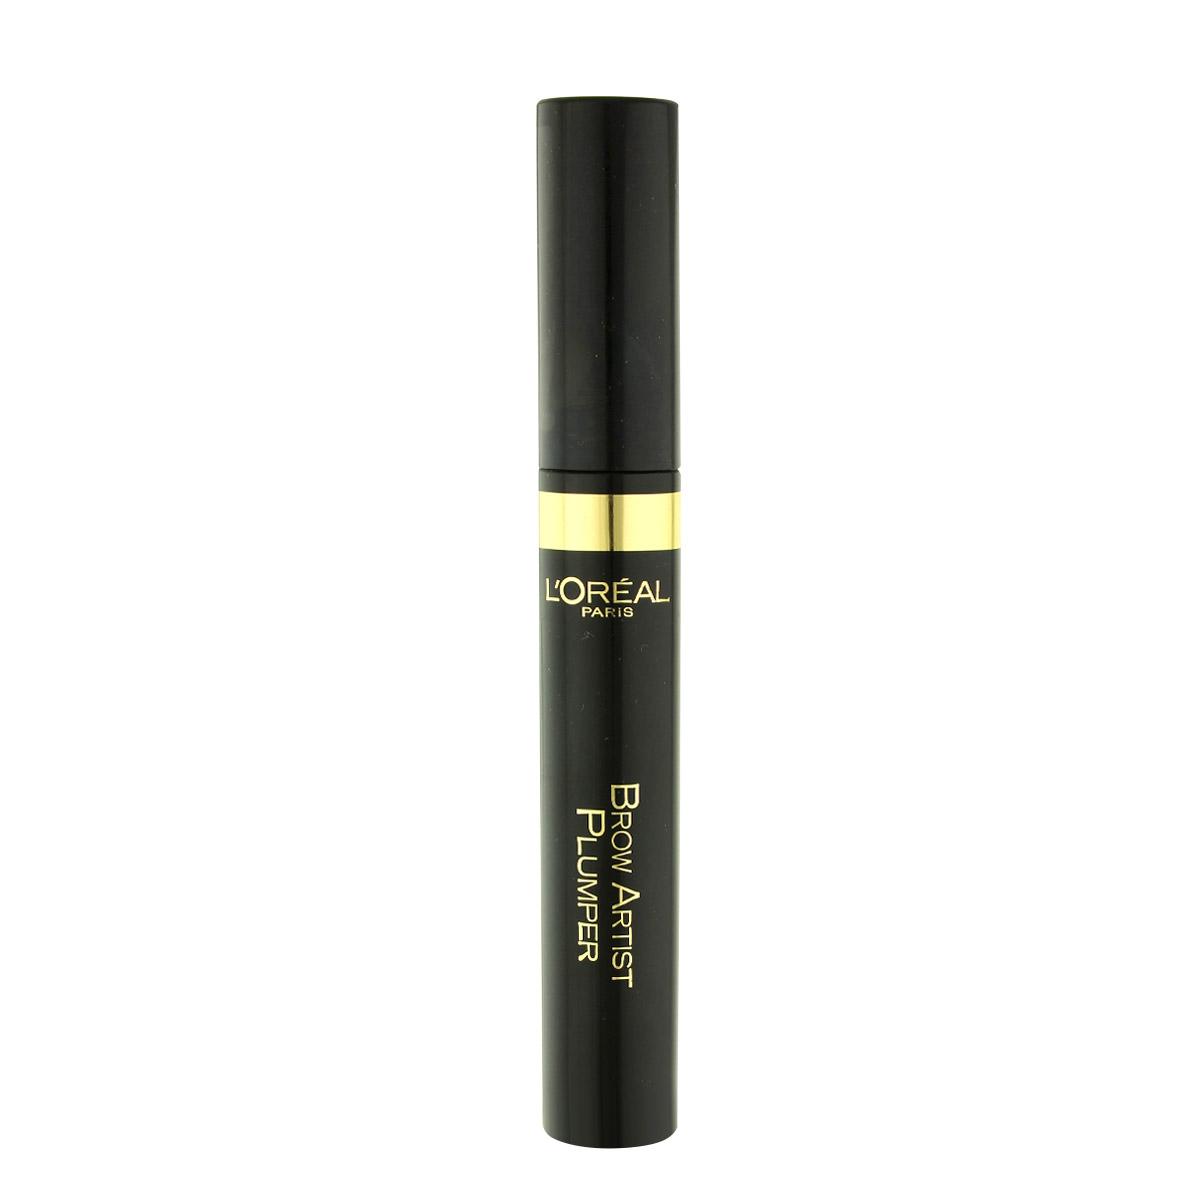 L'Oréal Paris Brow Artist Plumper Mascara (Transparent) 7 ml 78428